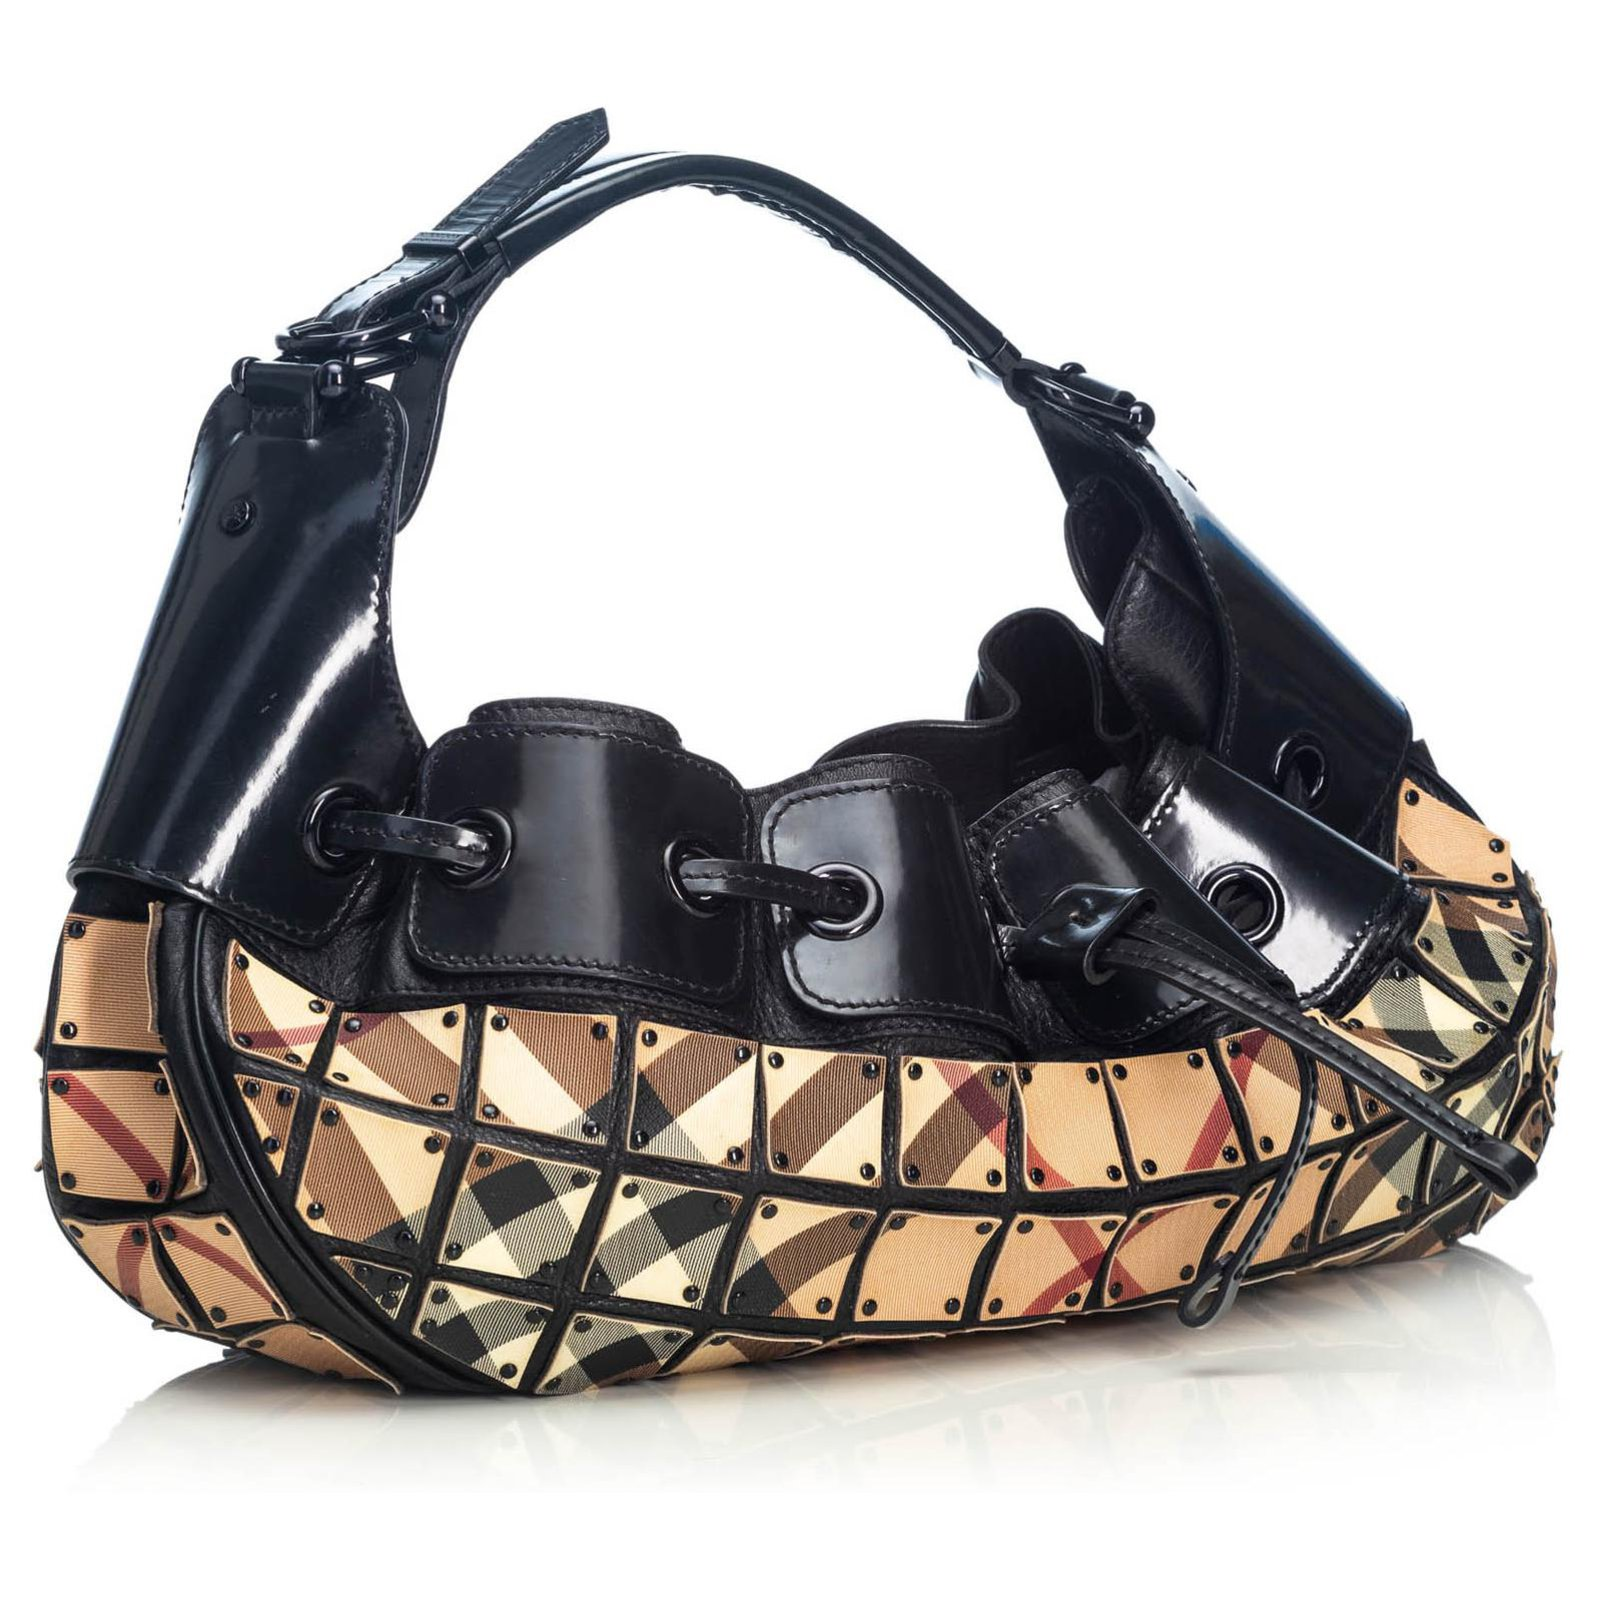 bc3ce23a6107 Burberry Burberry Brown Nova Check Warrior Hobo Handbags Leather ...